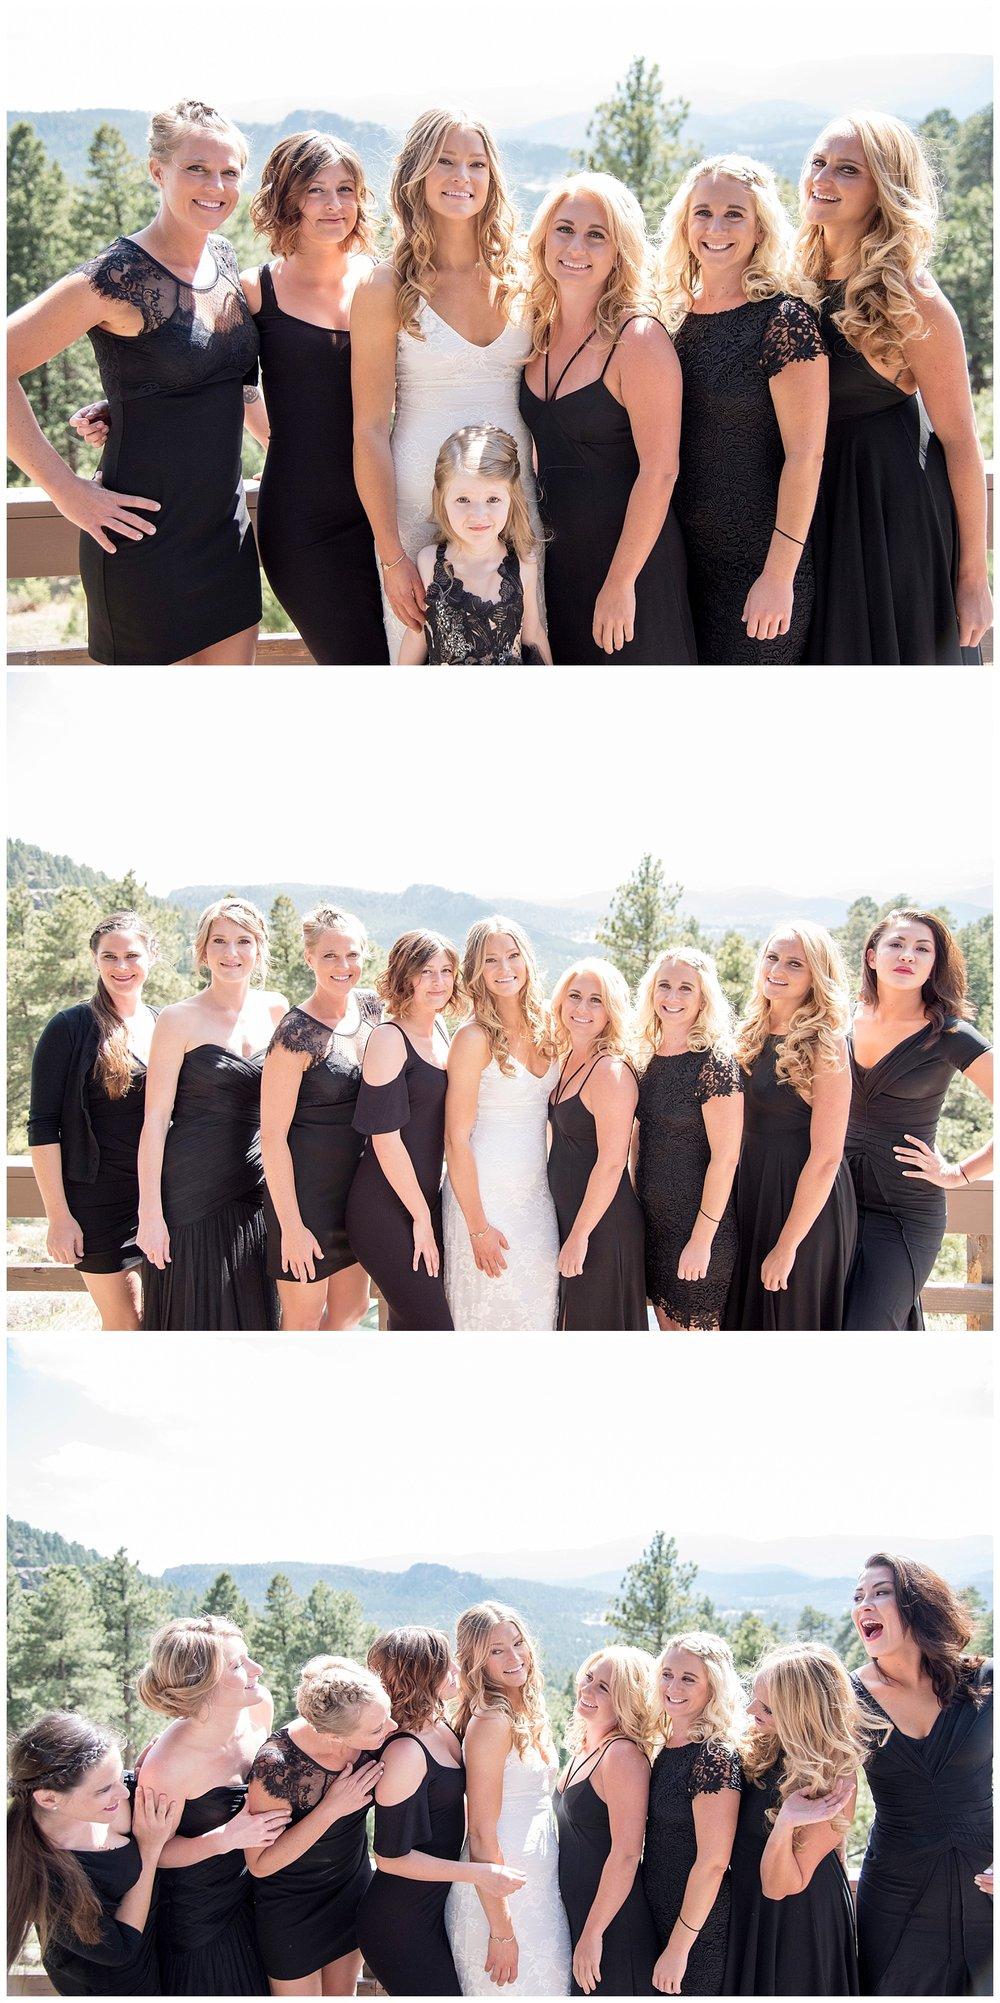 Farm_Wedding_Photographer_Evergreen_Lake_House_Colorado_Barn_Destination_Hawaii_Photography_Mountain_Weddings_007.jpg